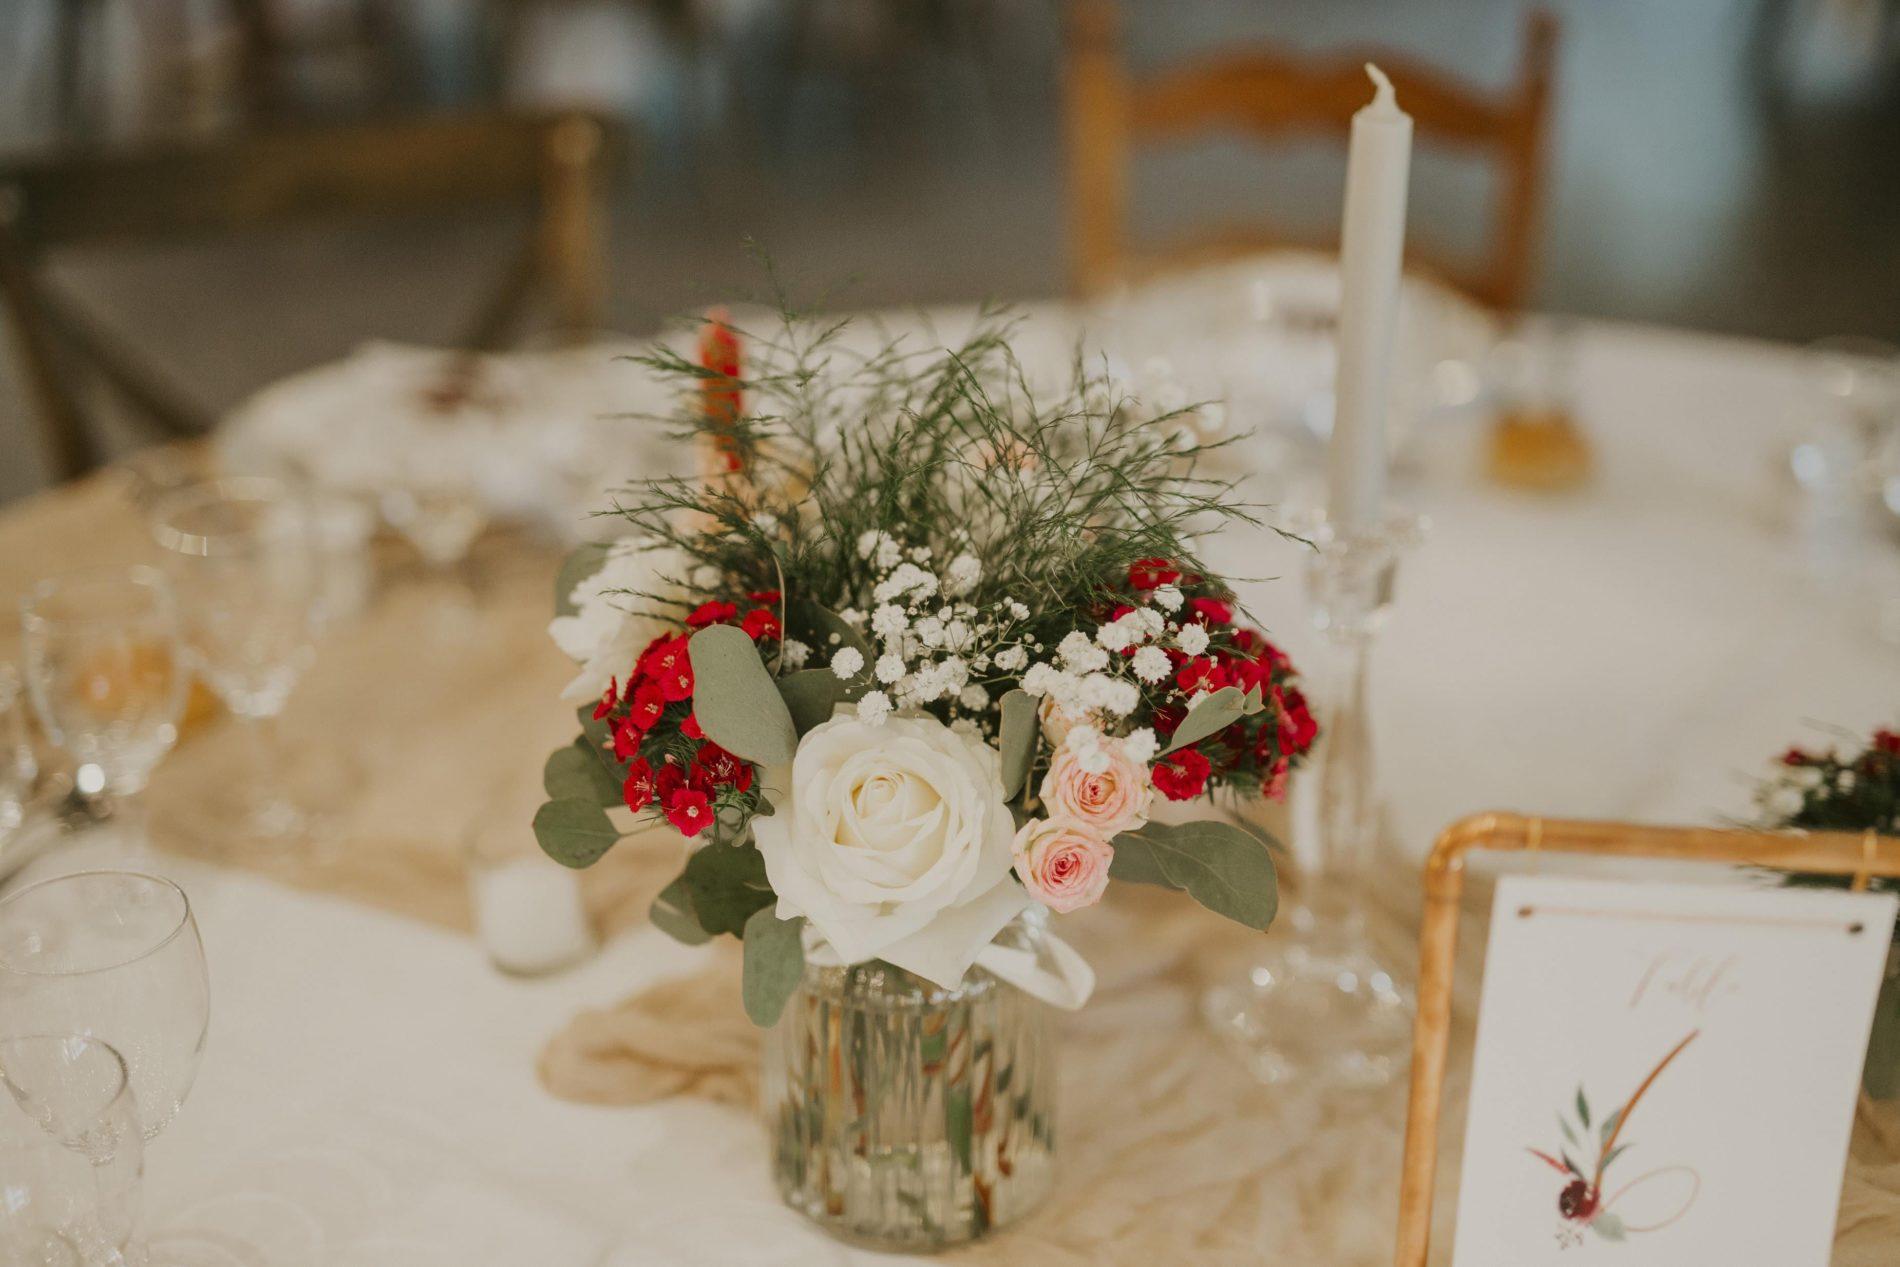 0146_04-CelineSereivuth-148-obonheurdesdames-decoration-mariage-location-Jordane-Chaillou